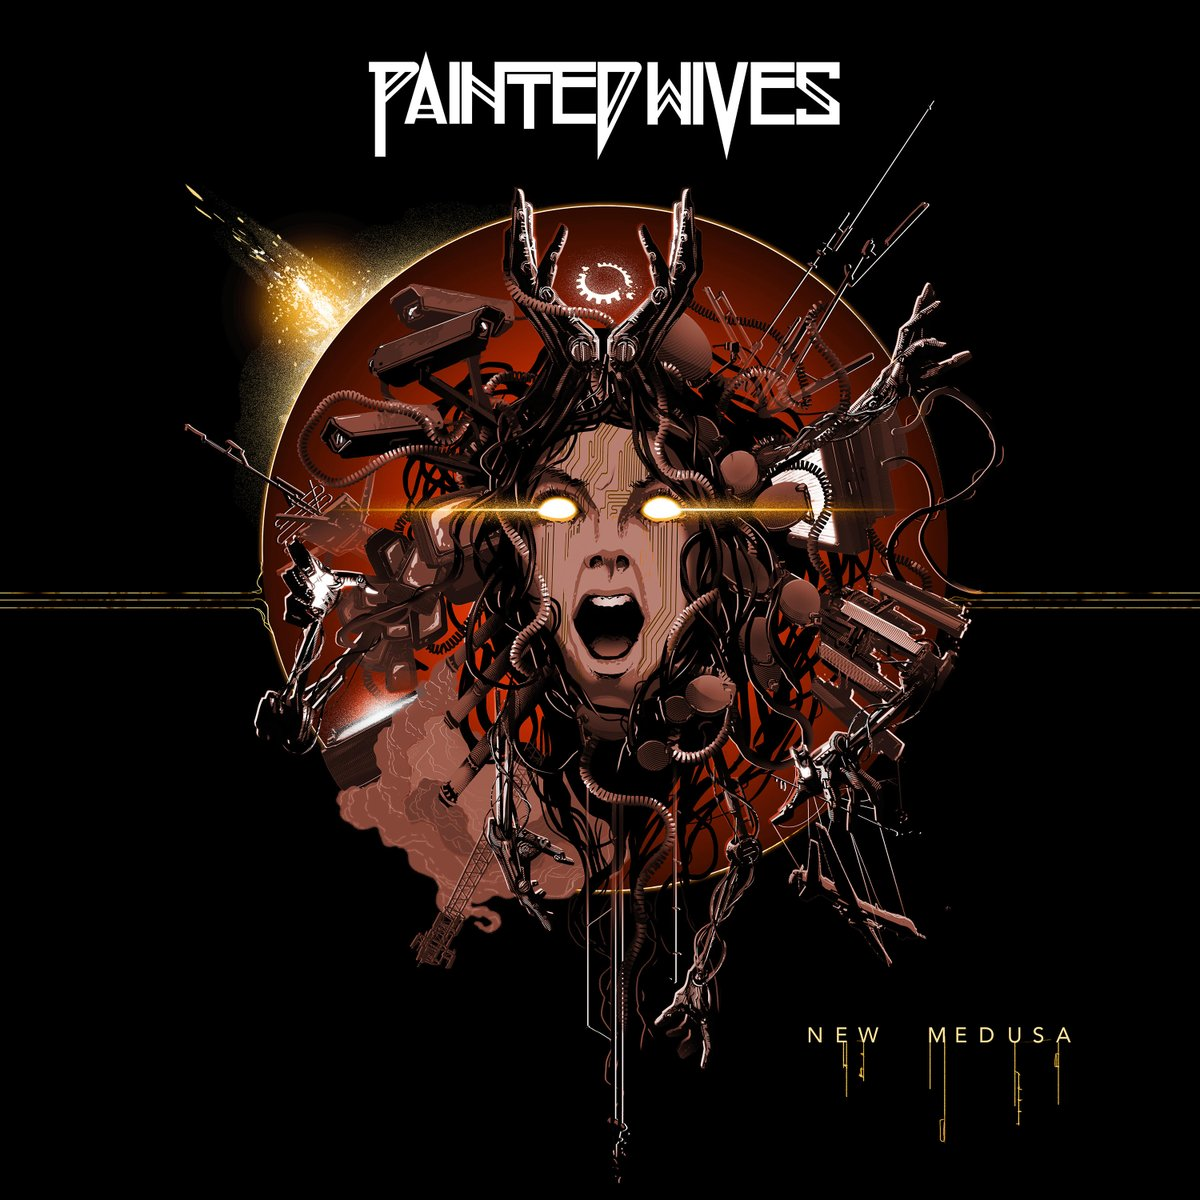 .@PaintedWives release their full-length album 'Medusa' today -   #paintedwives #NewMedusa #NewMusicFriday